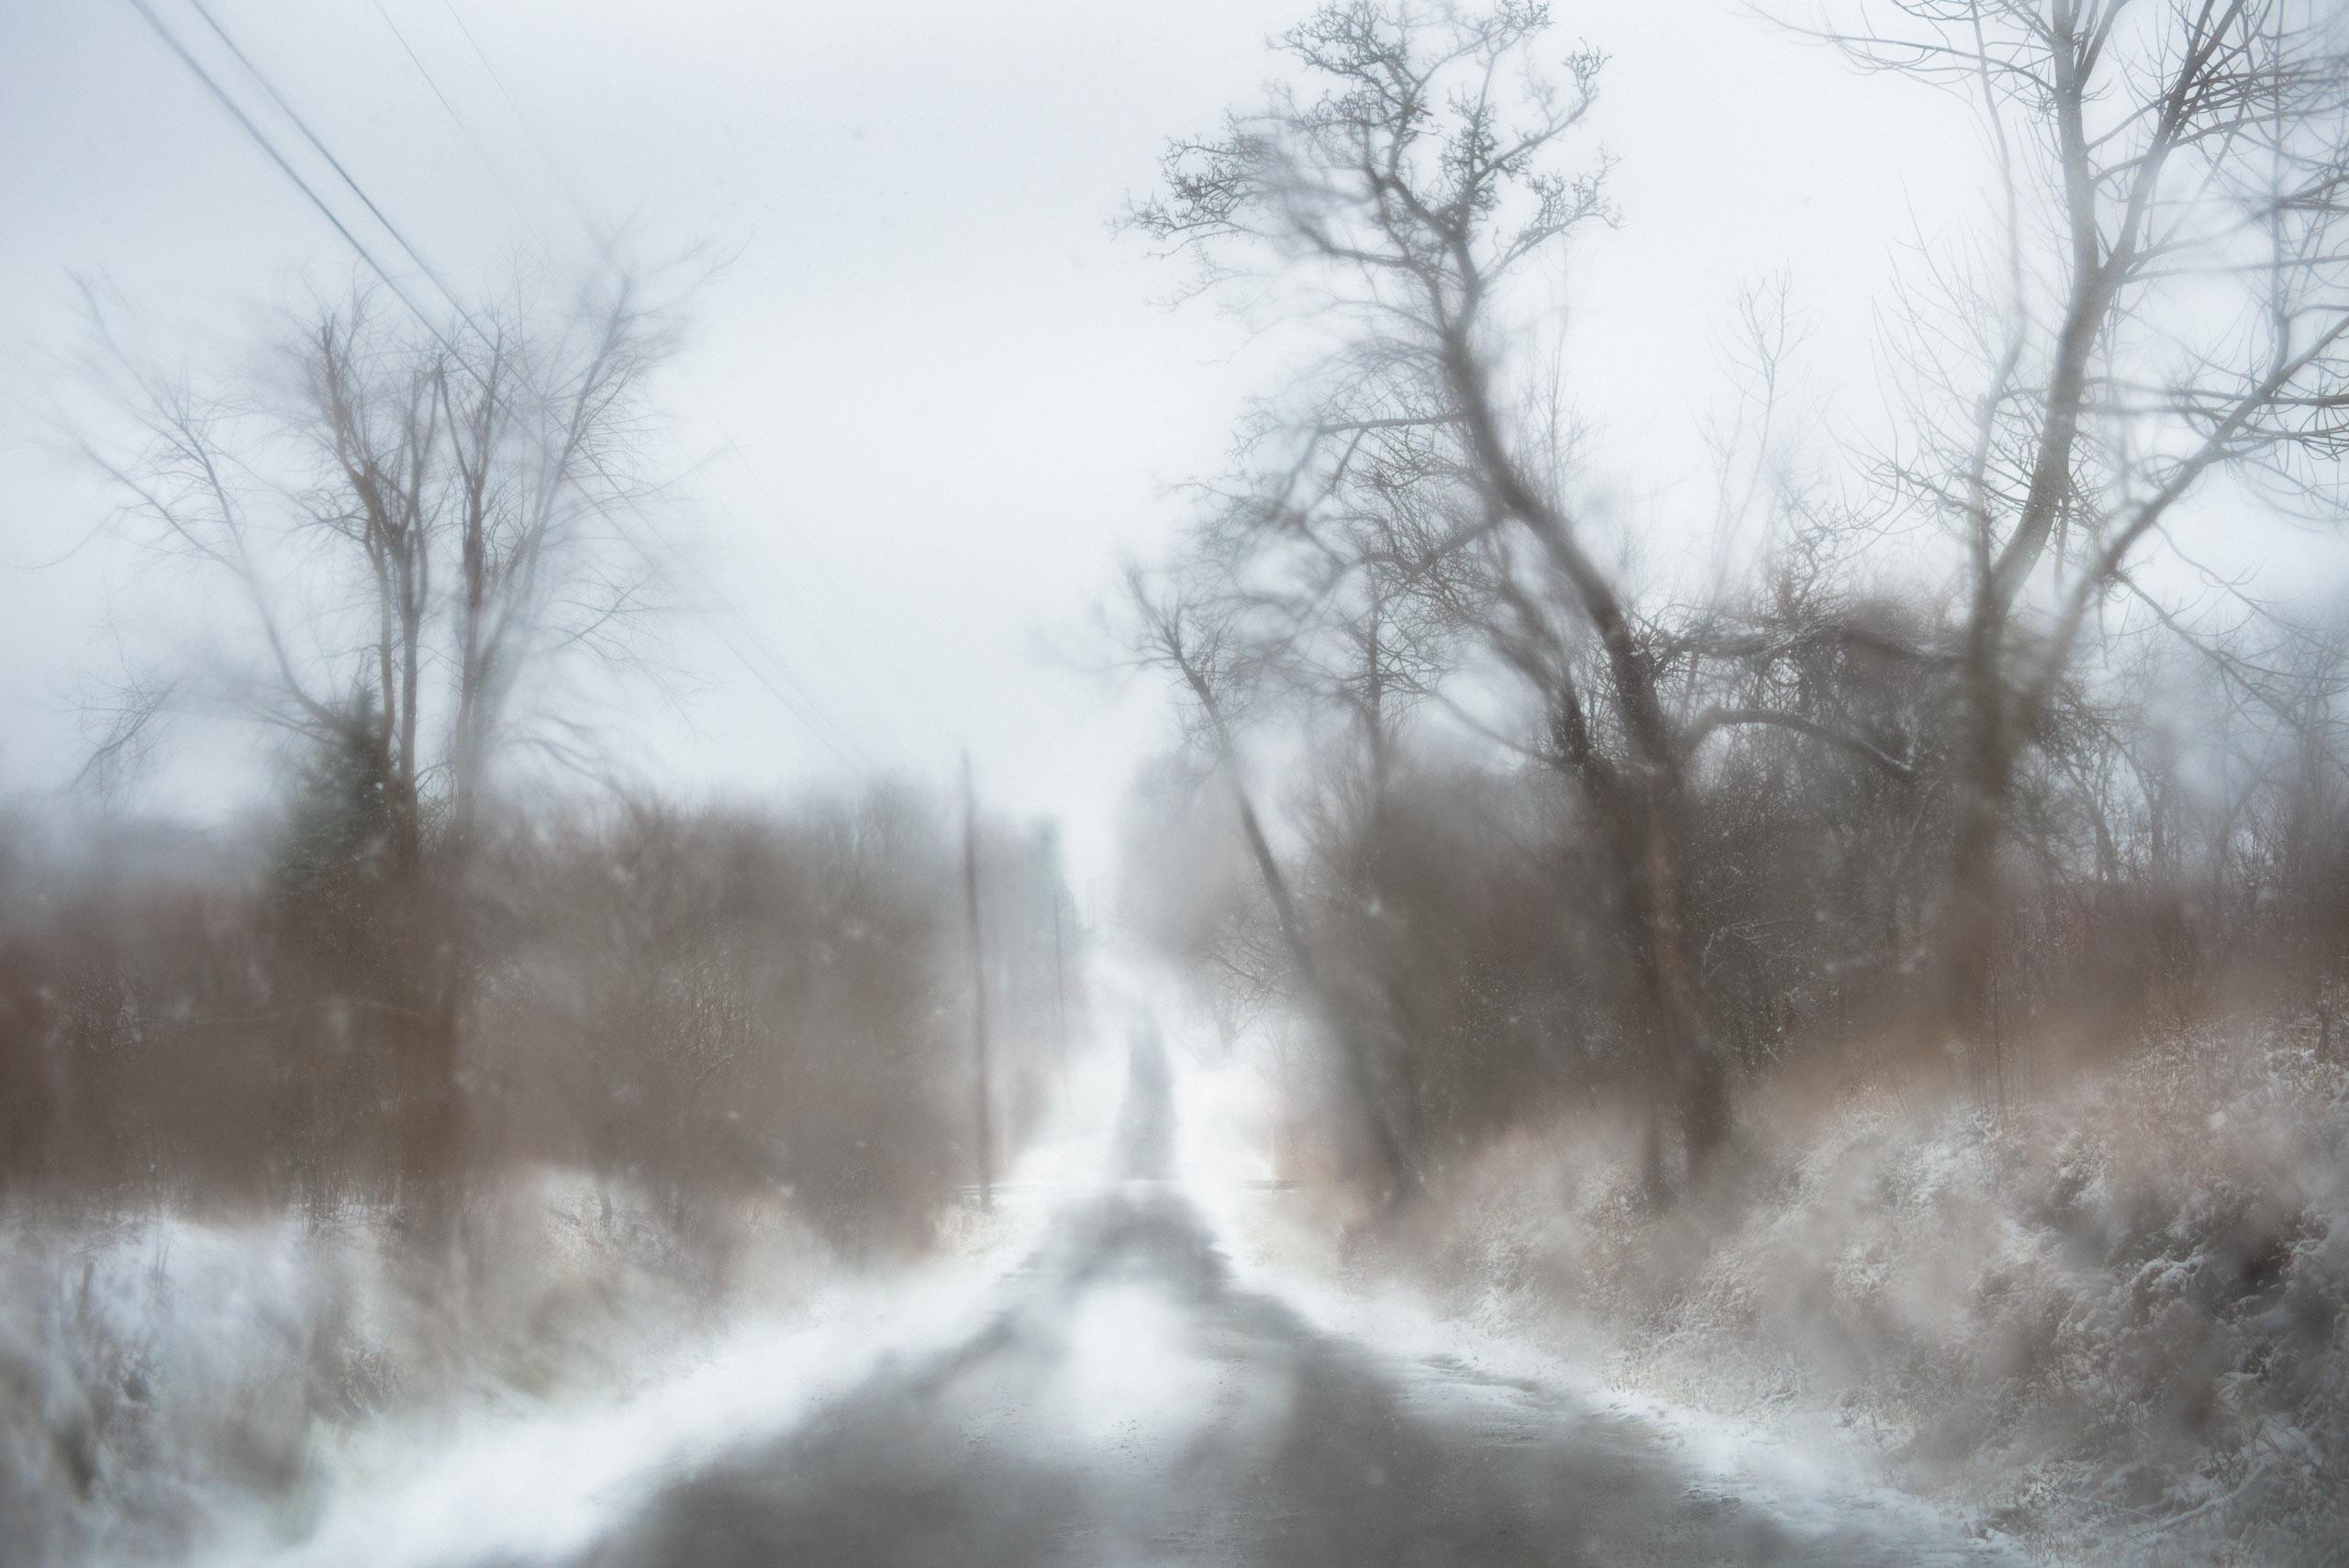 Todd Hido shot this photograph with a digital camera, a Nikon D800.